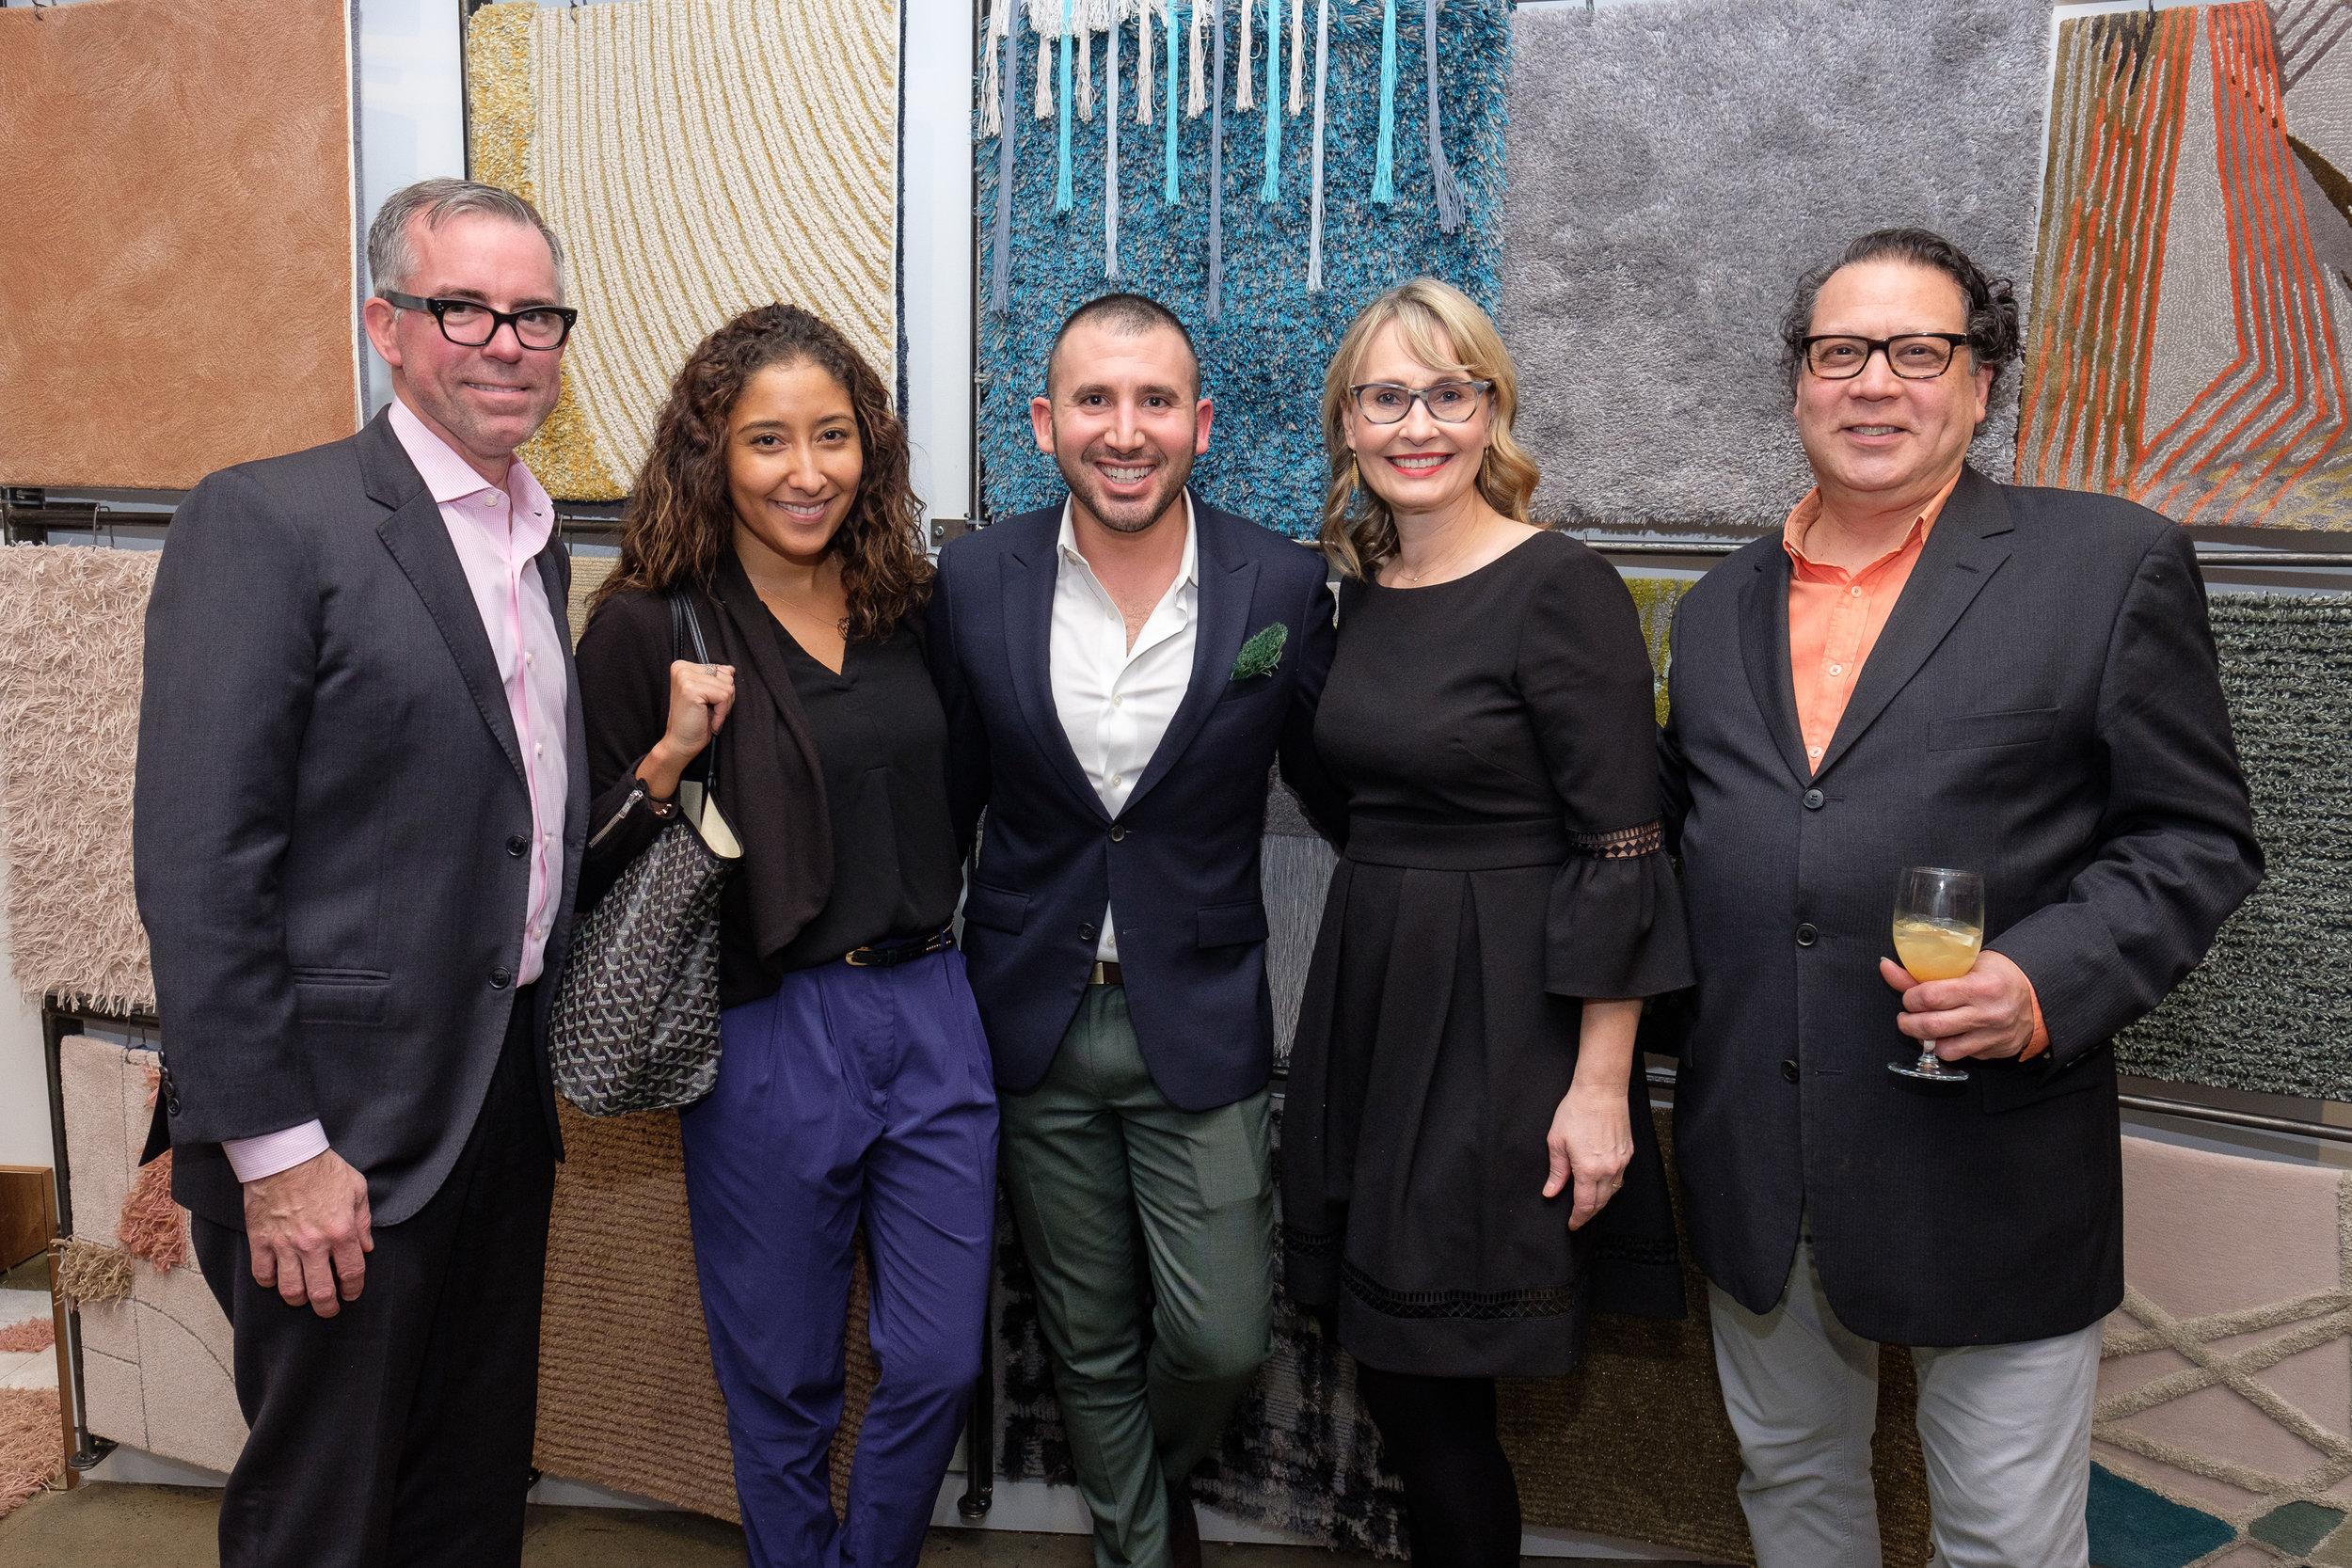 Michael Fagan, Veronica Bennett, Alan Gilmer (Edward Fields), Karen Majestic (Edward Fields), James Reyman (Reyman Studio)